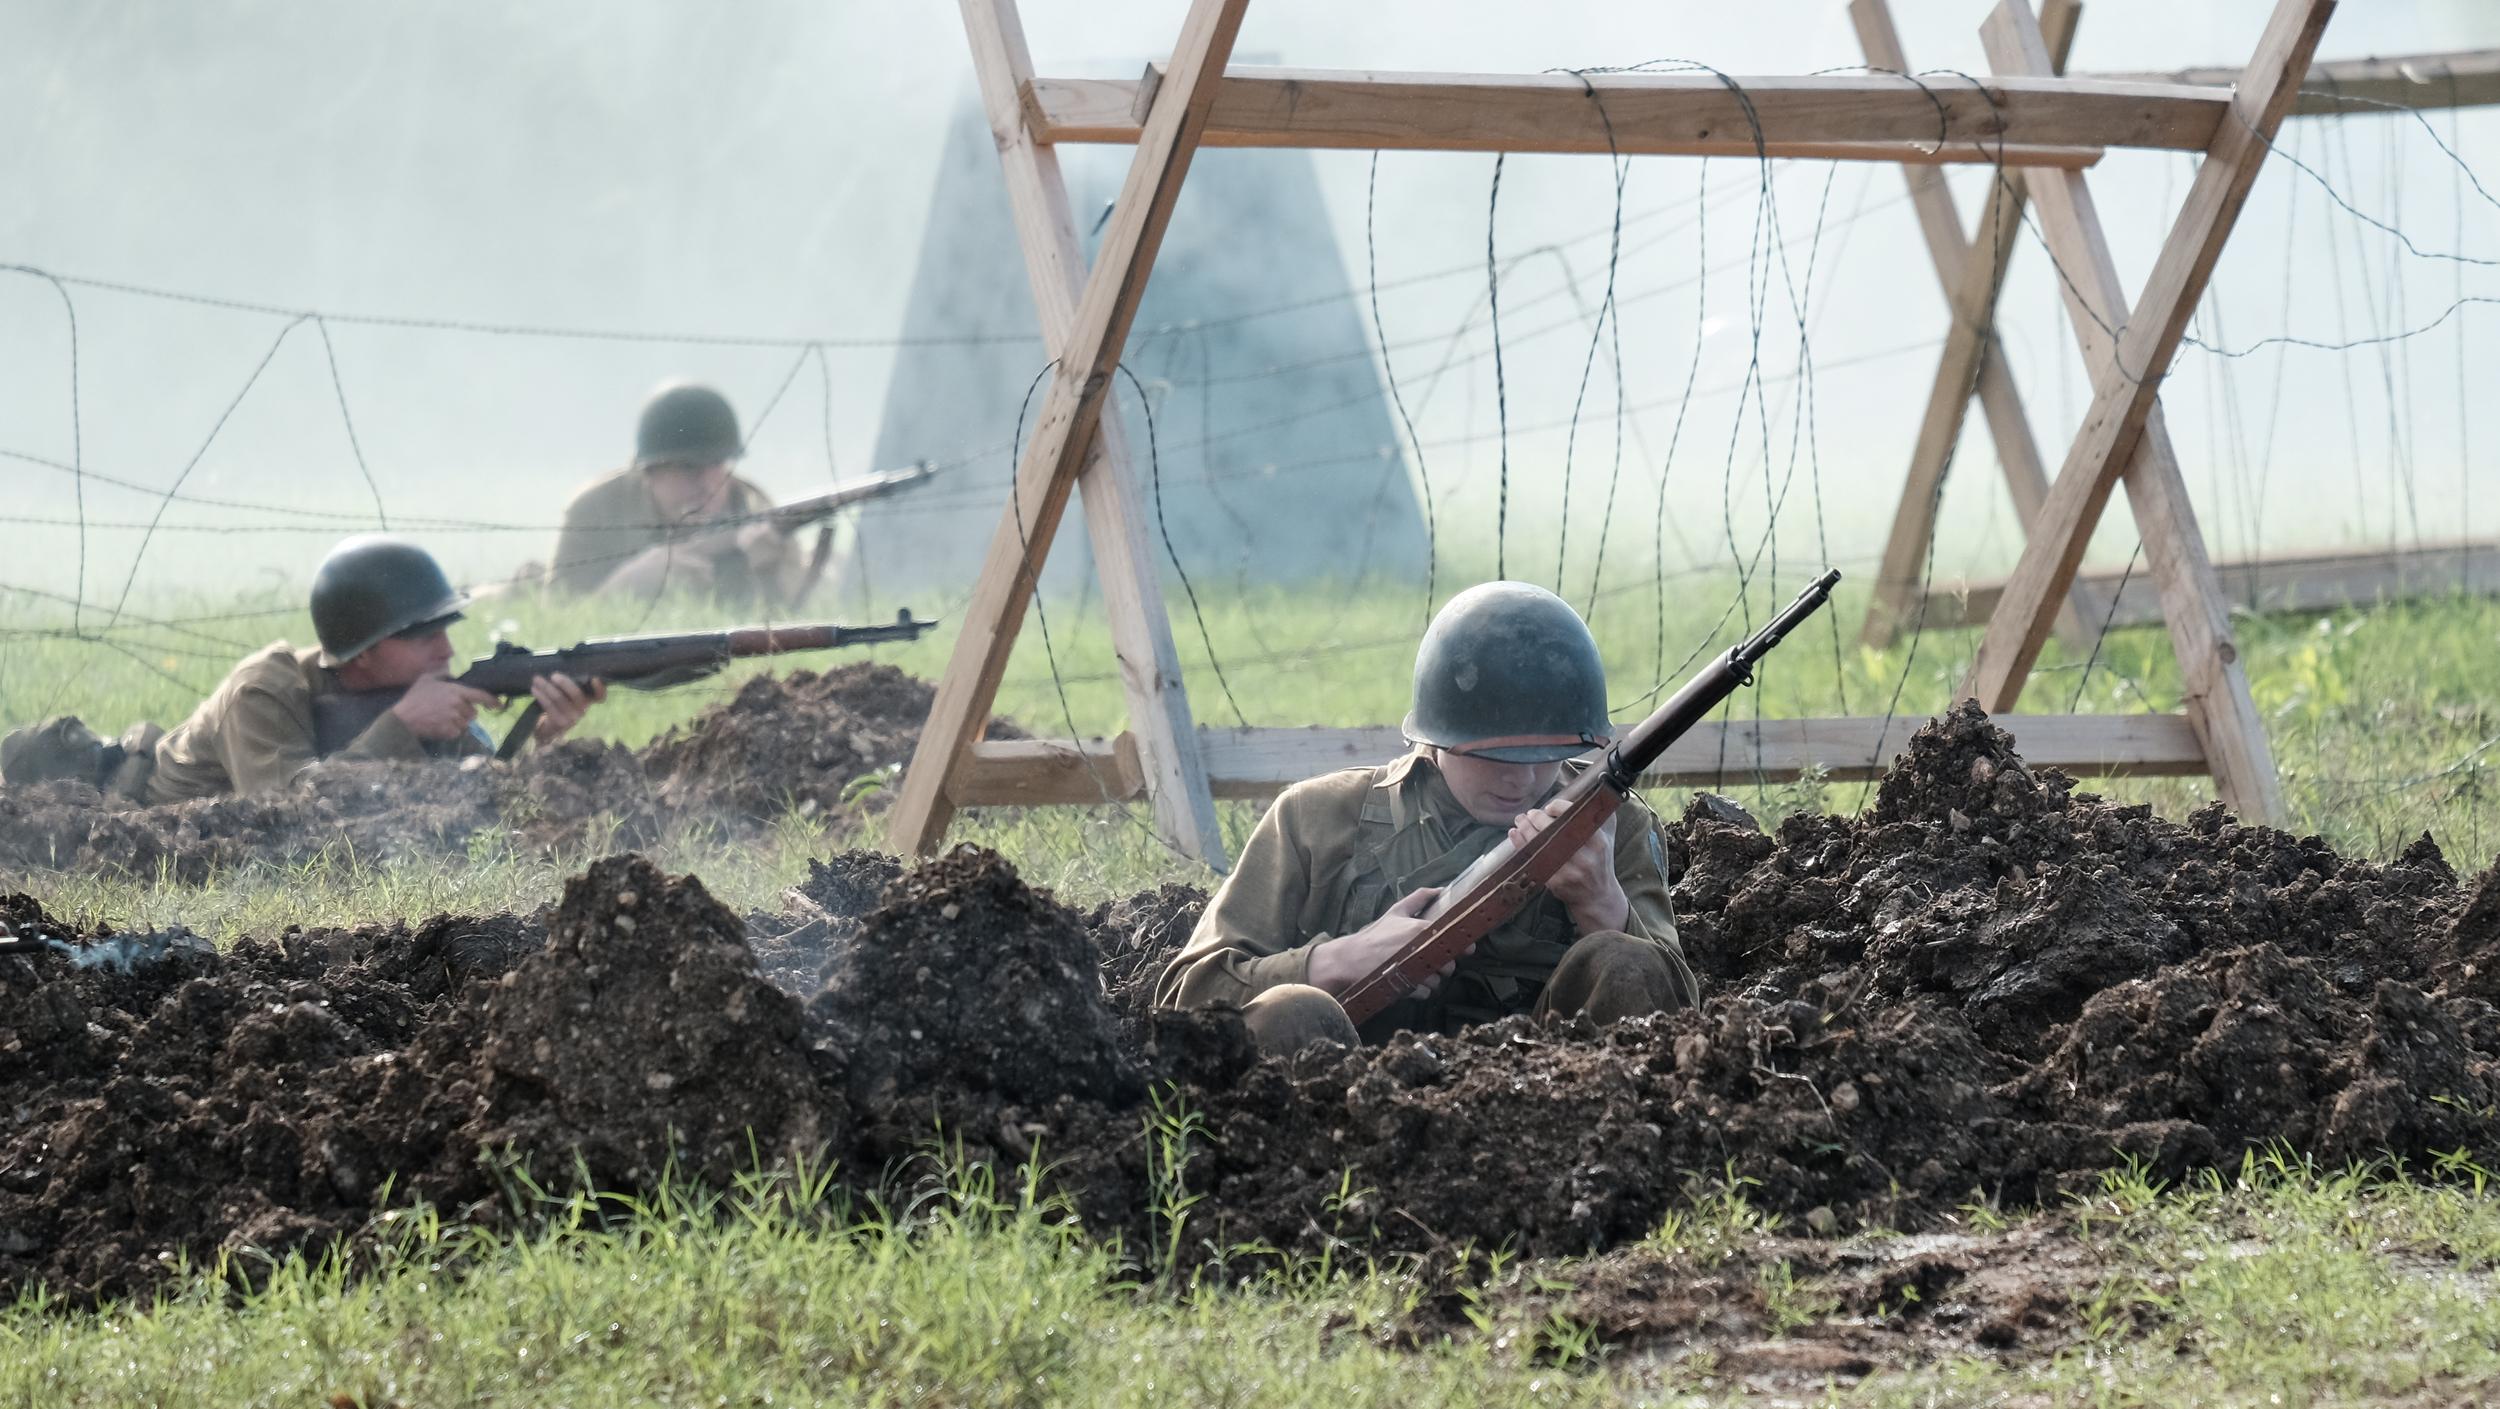 camp-mabry-close-assault-110815-5260.jpg